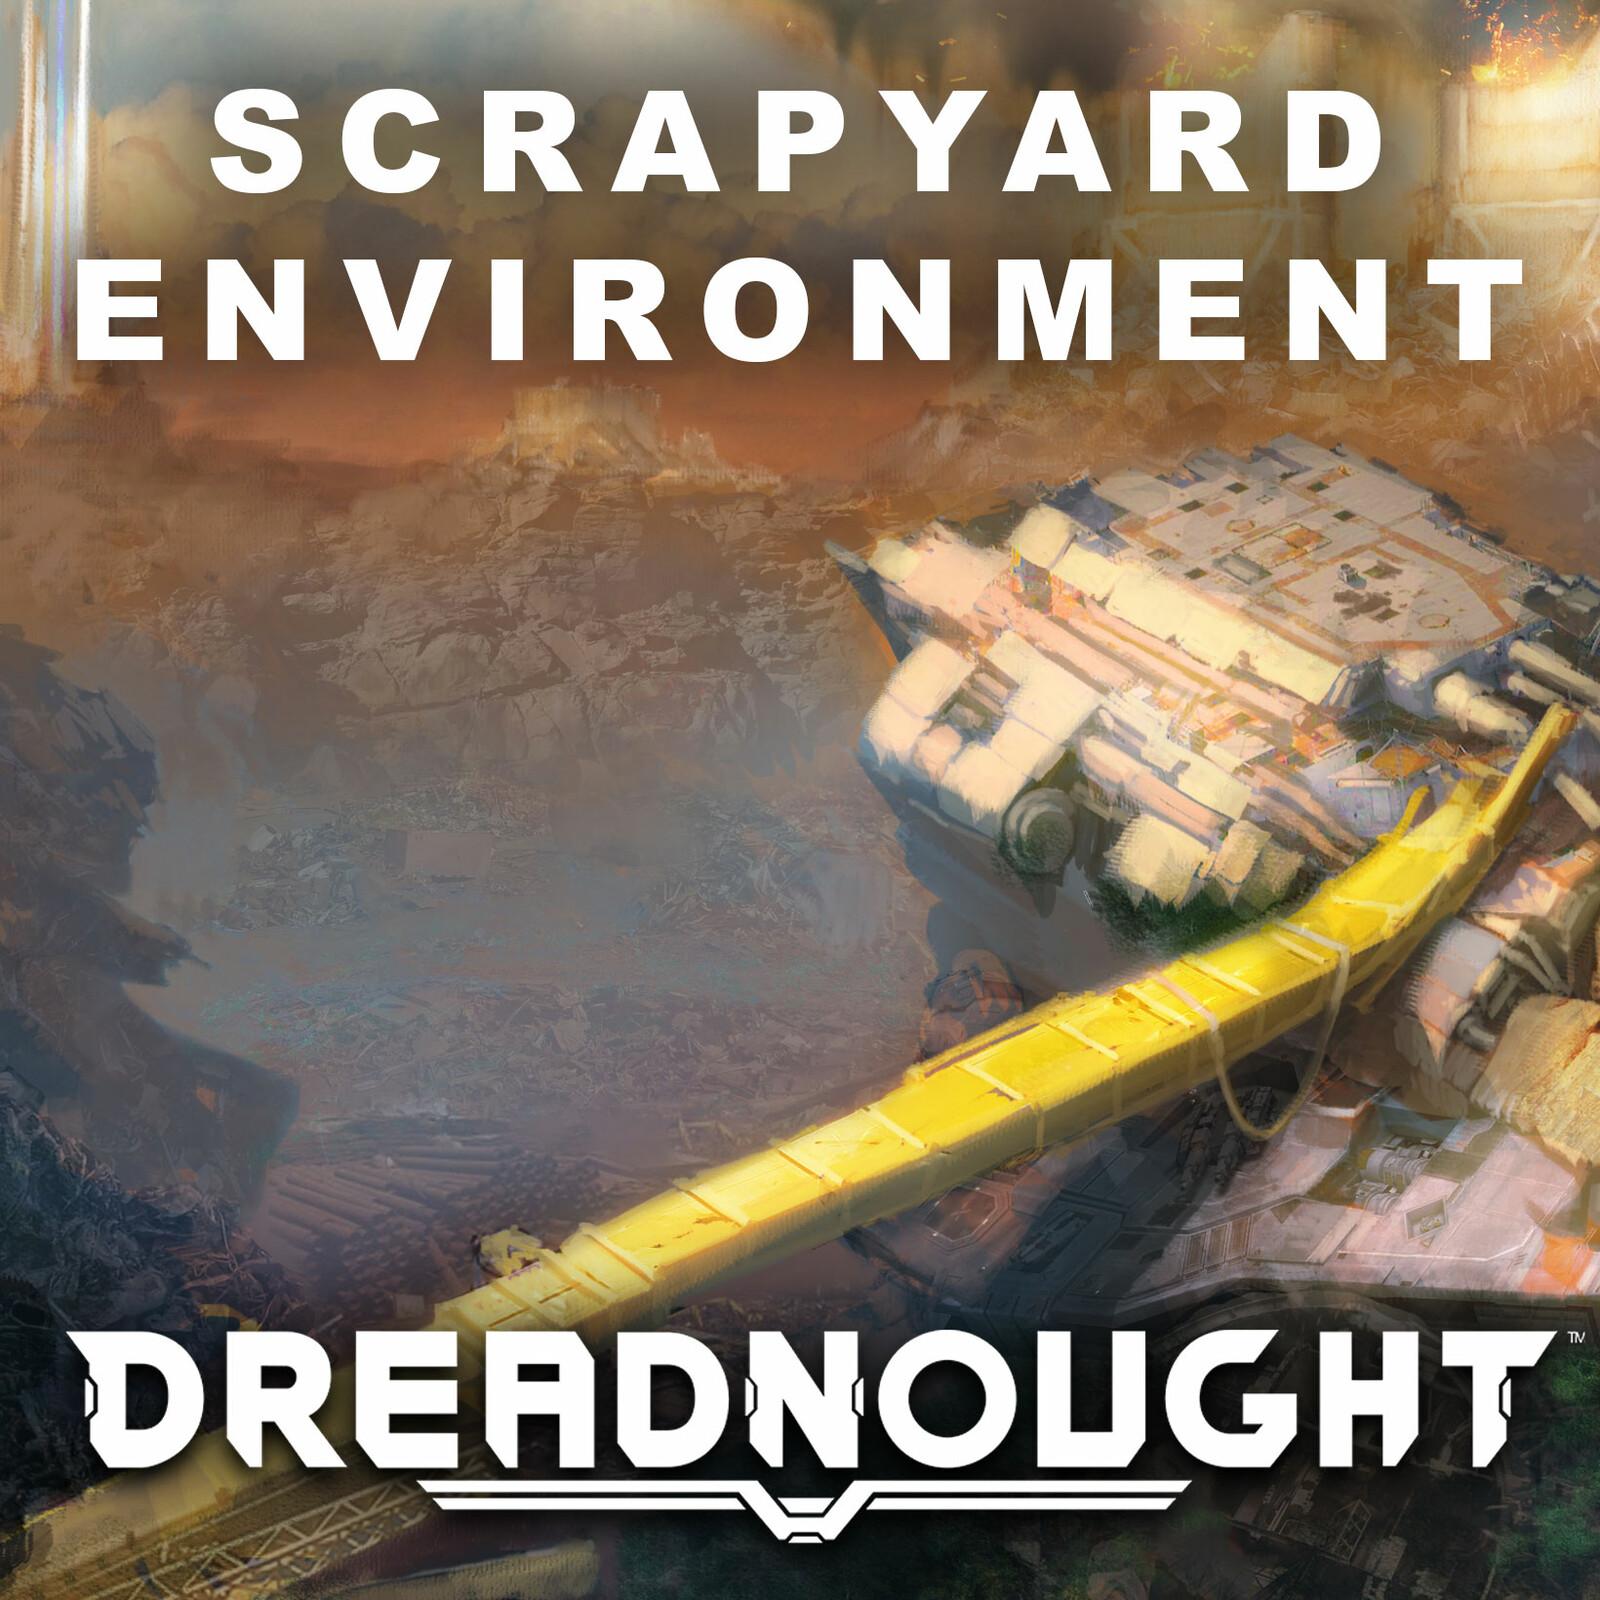 Scrapyard Environment